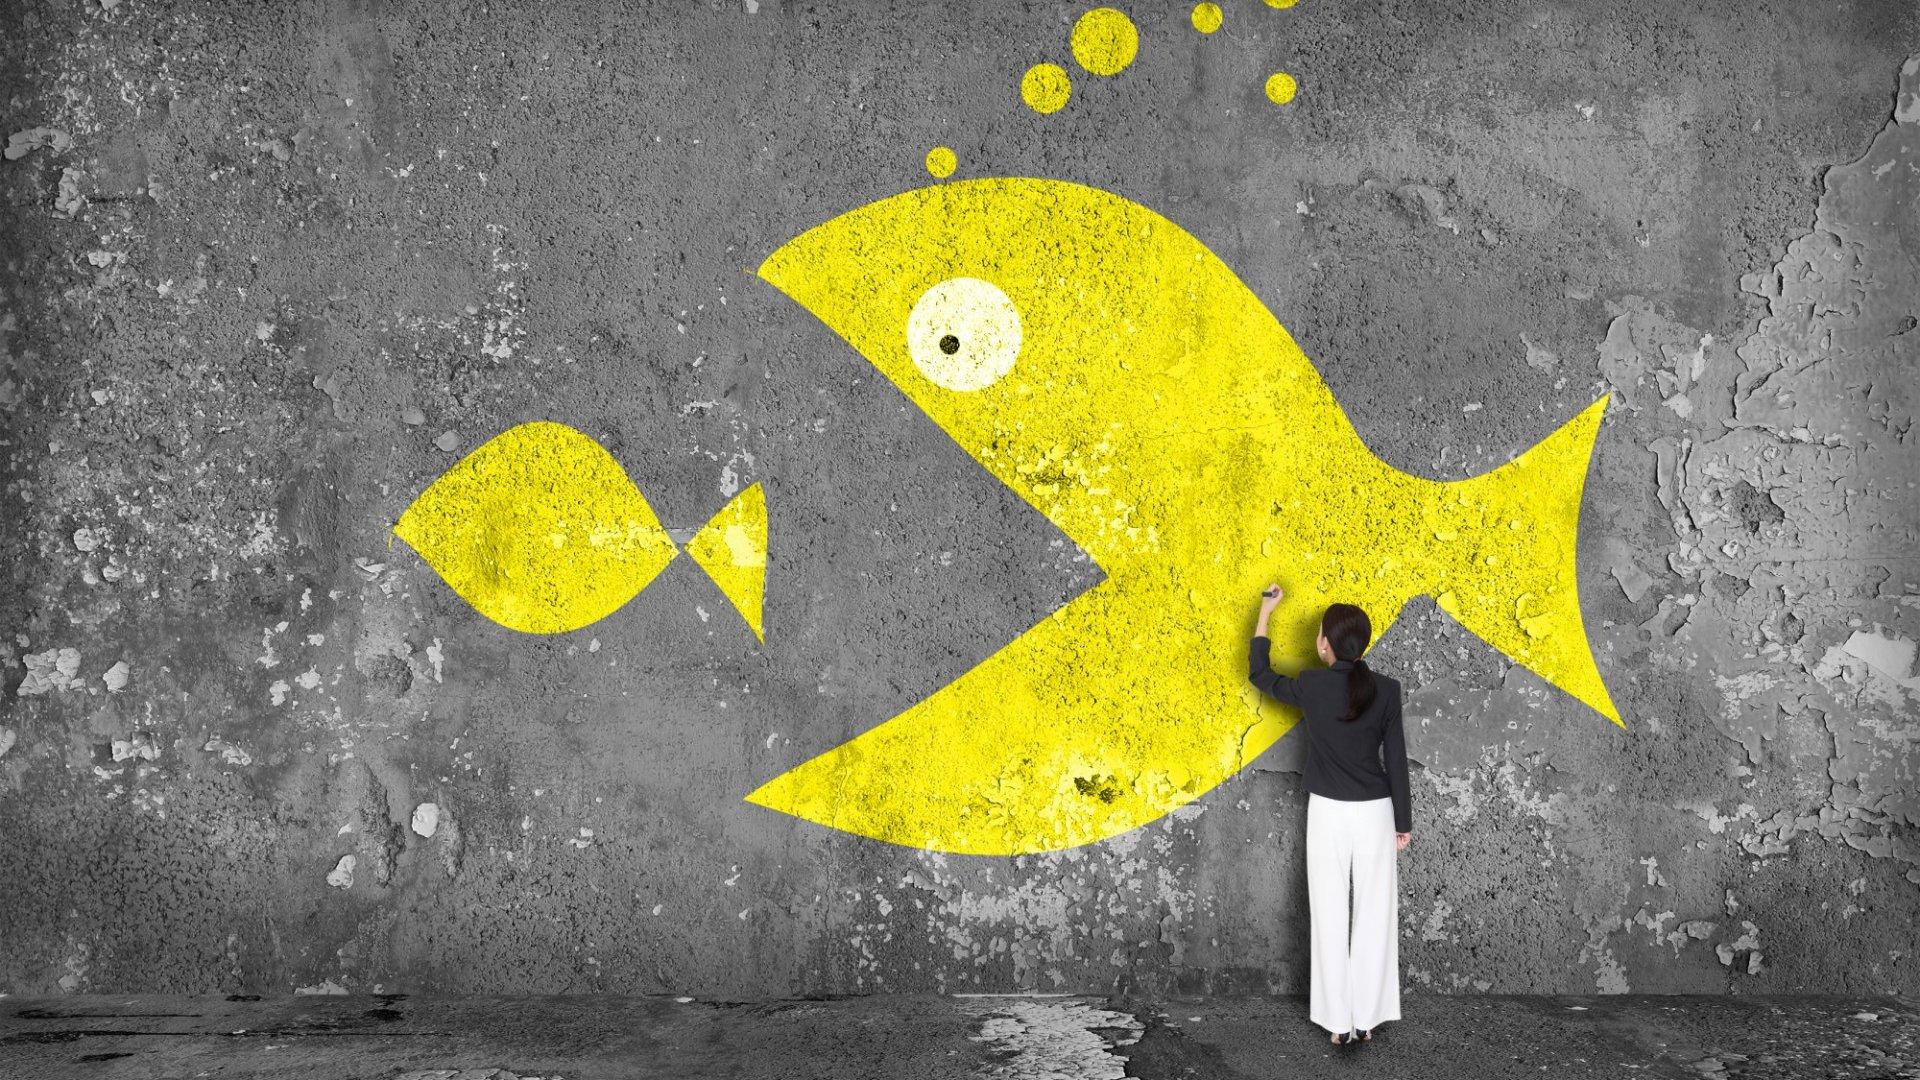 Does Your Acquisition Process Measure Up?